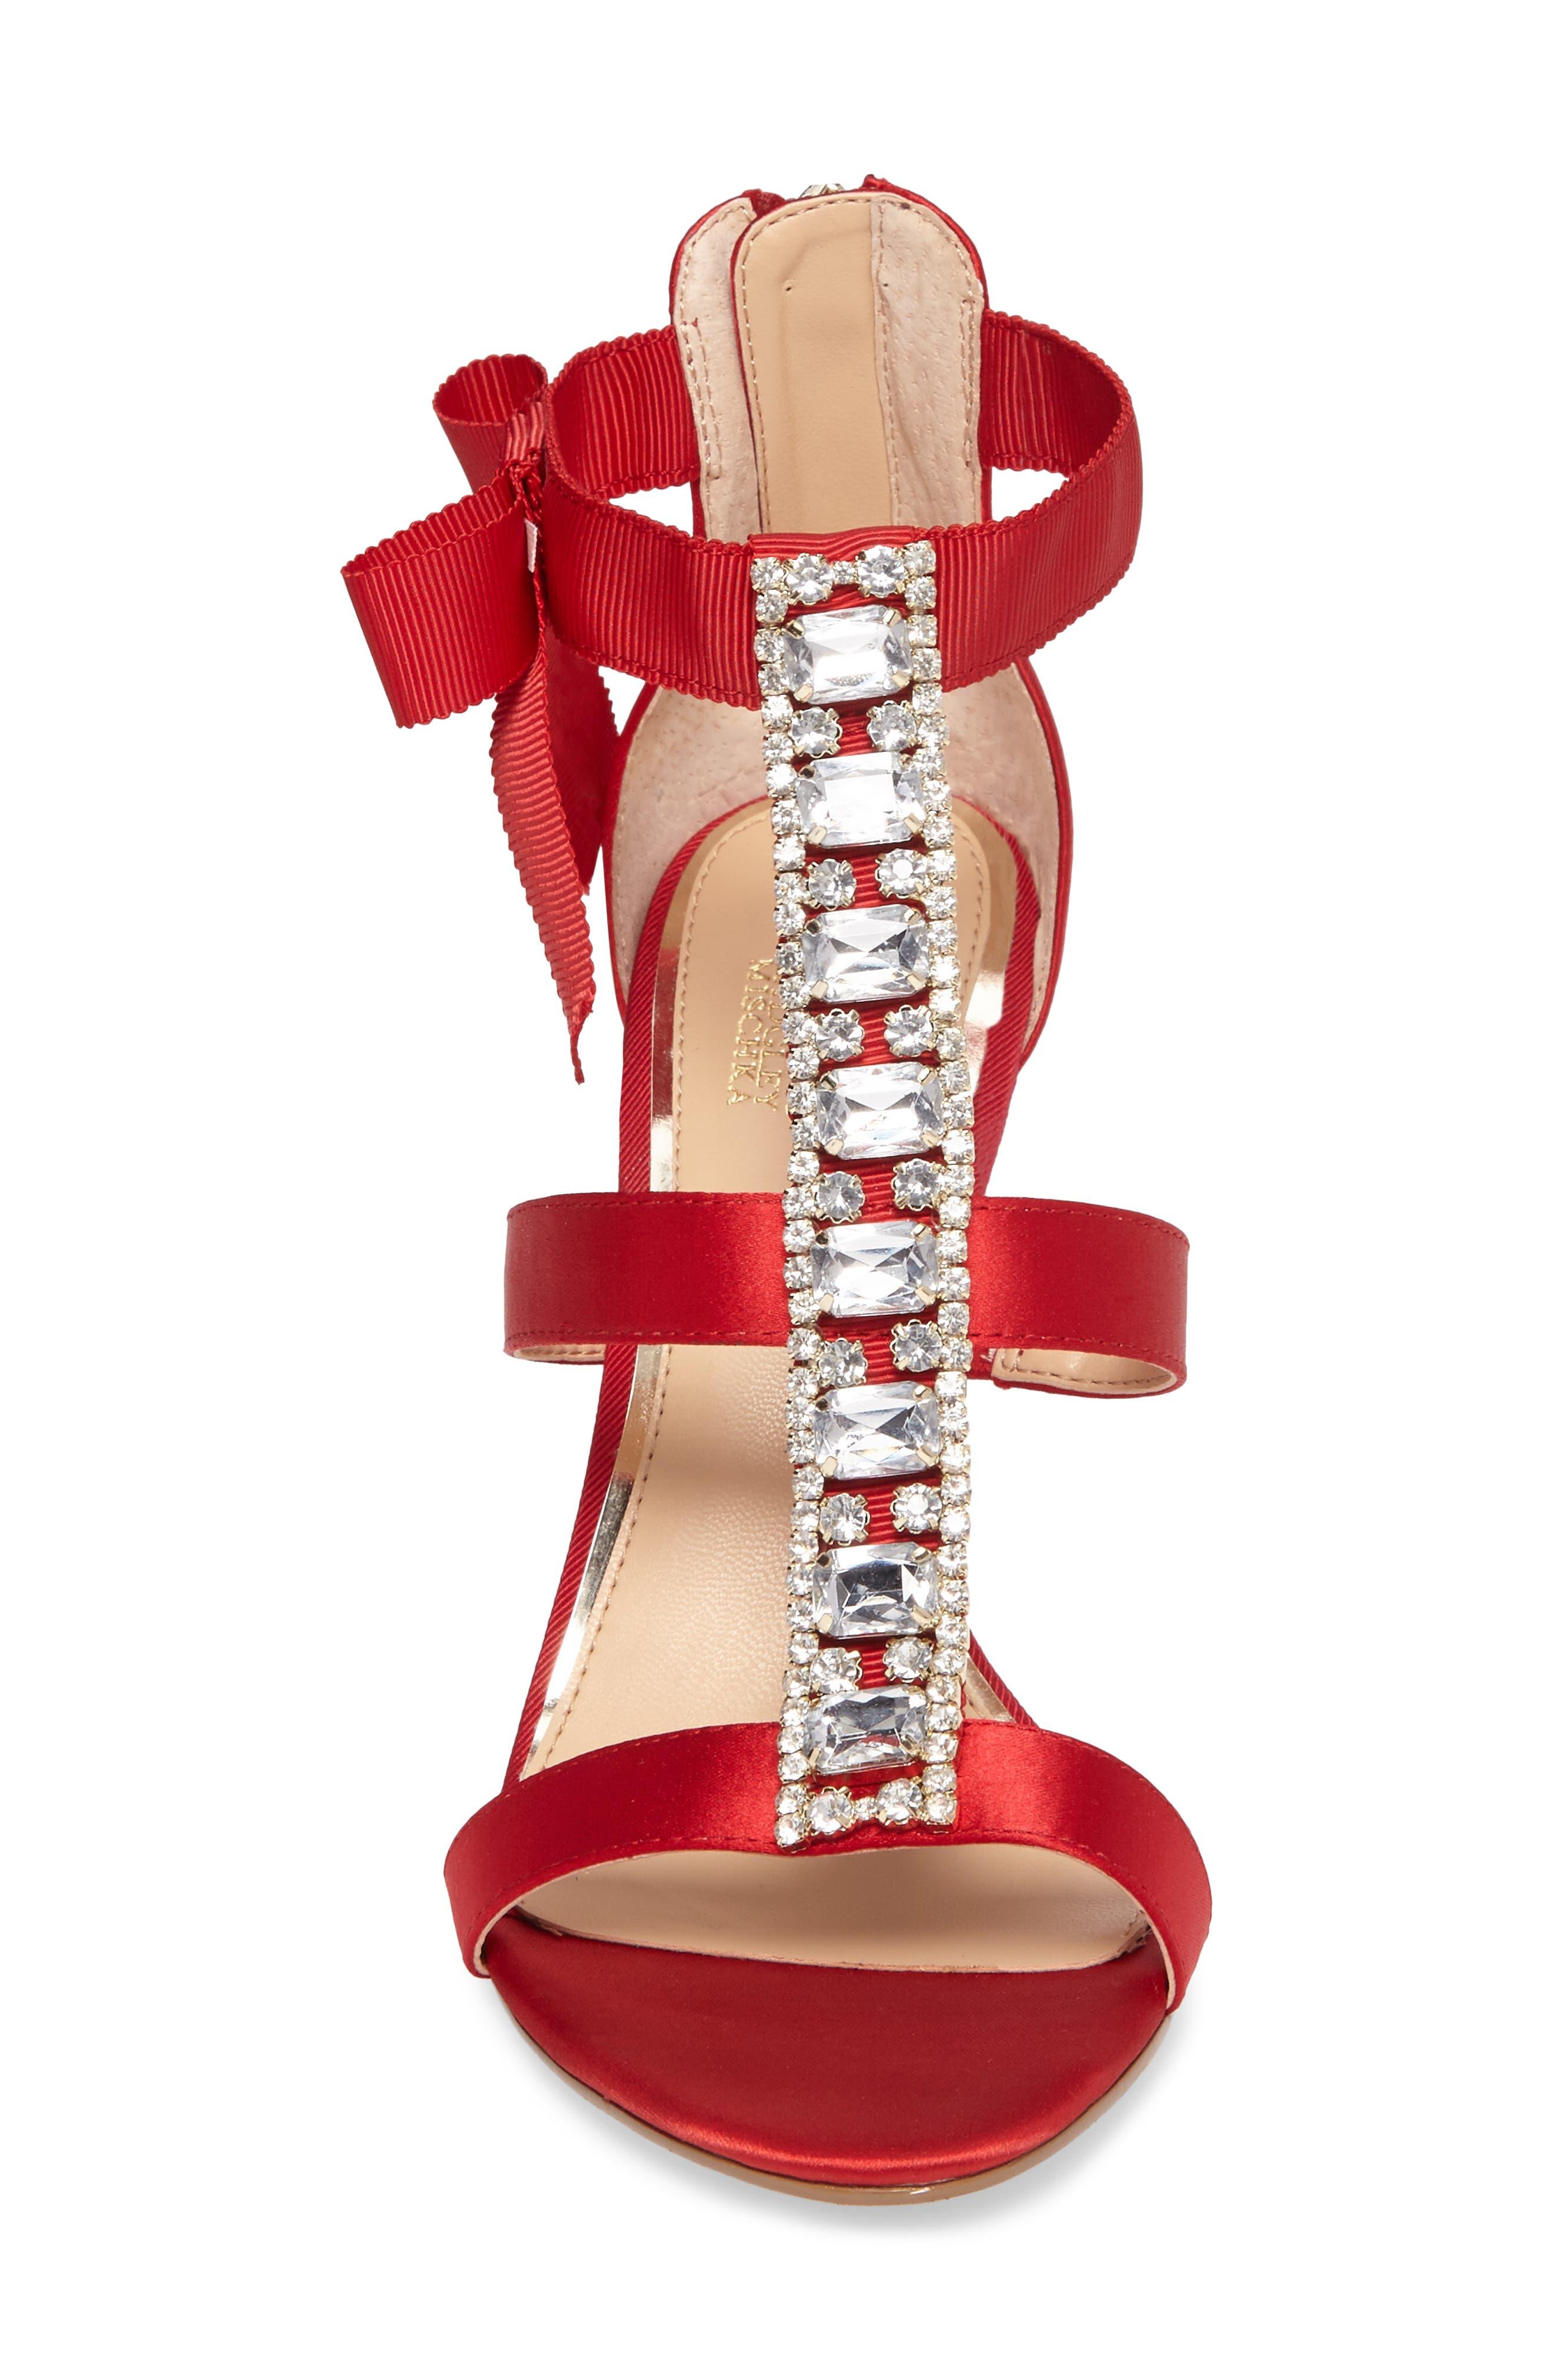 Henderson Embellished Bow Sandal,                             Alternate thumbnail 4, color,                             RED SATIN